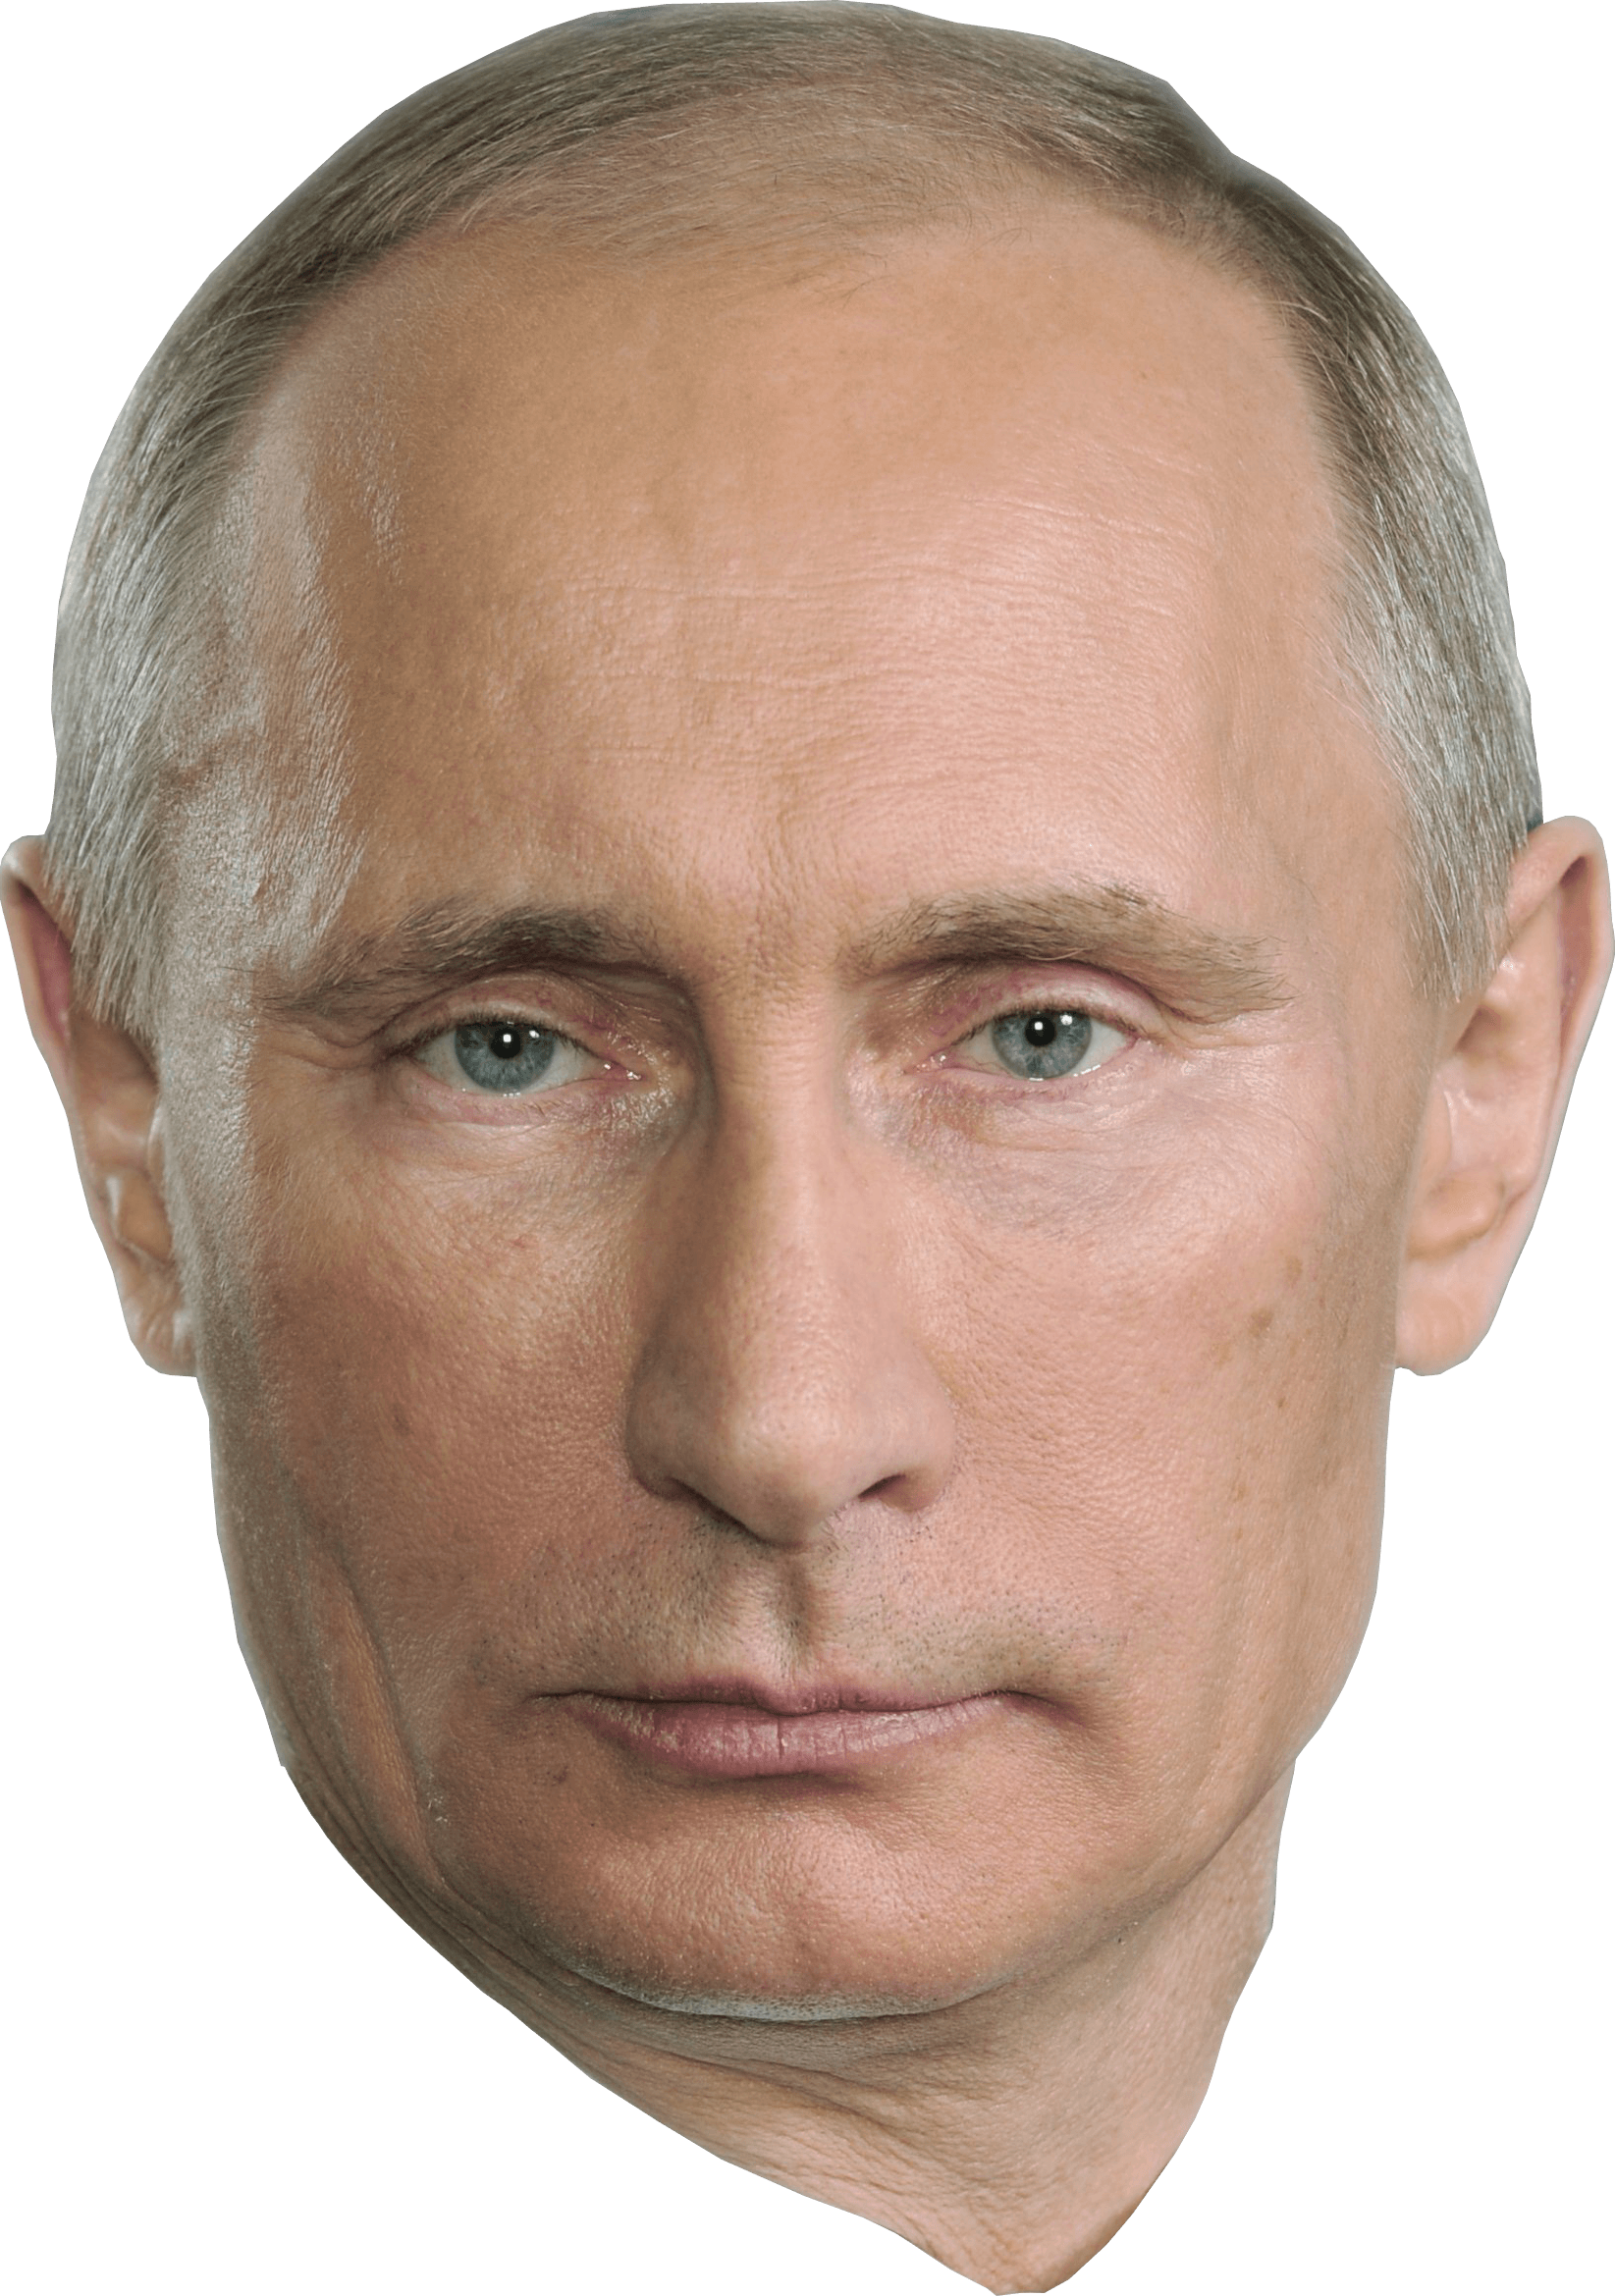 Vladimir Putin With Sunglasses transparent PNG.